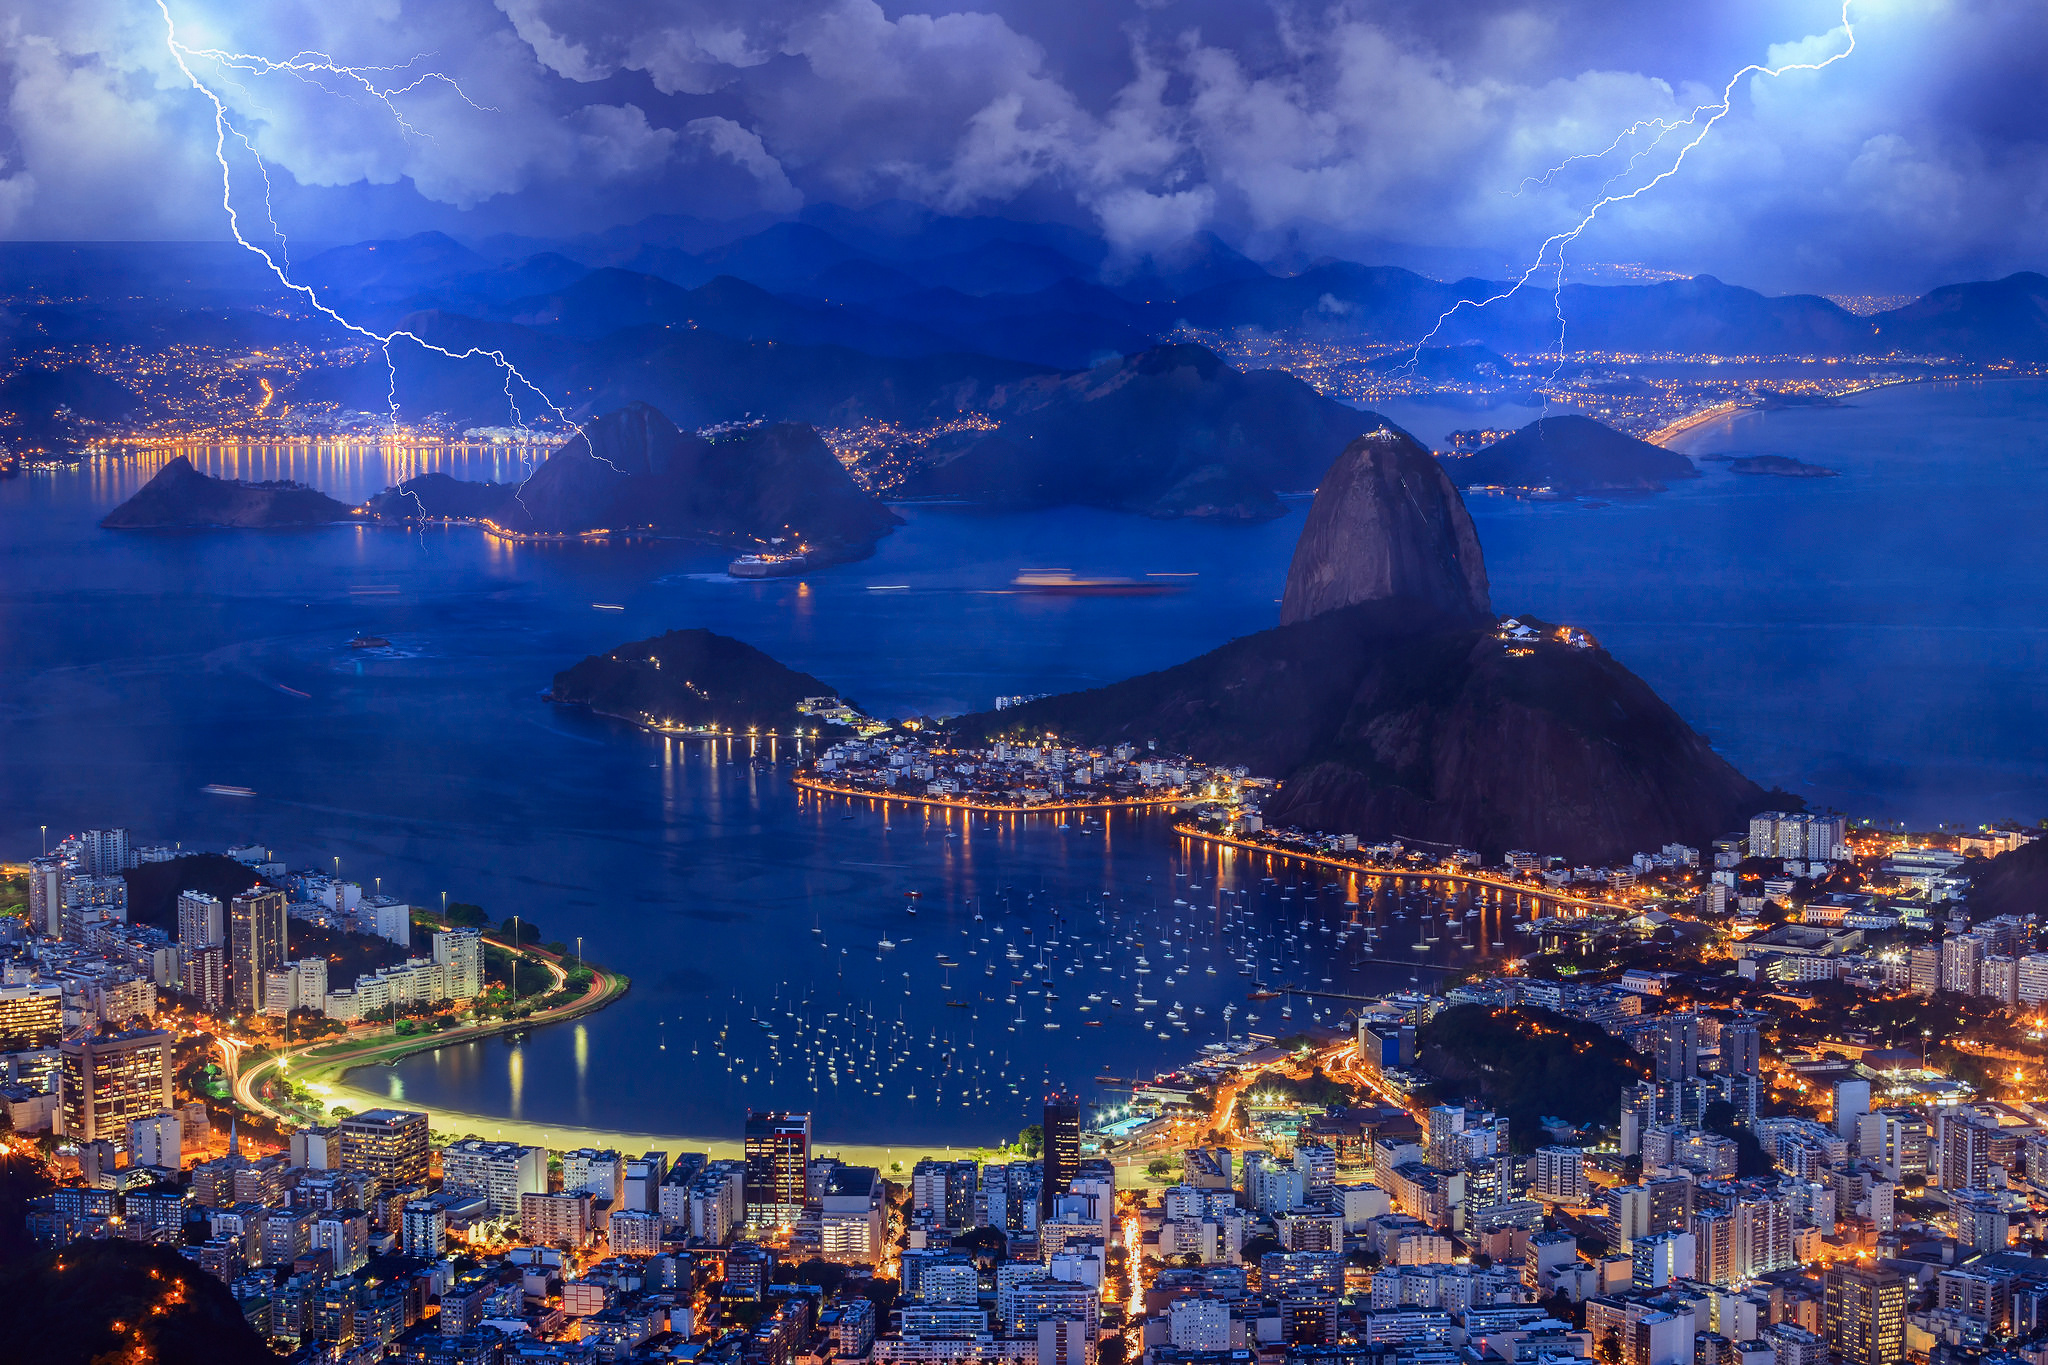 Storm over Botafogo HD Wallpaper Background Image 2048x1365 2048x1365